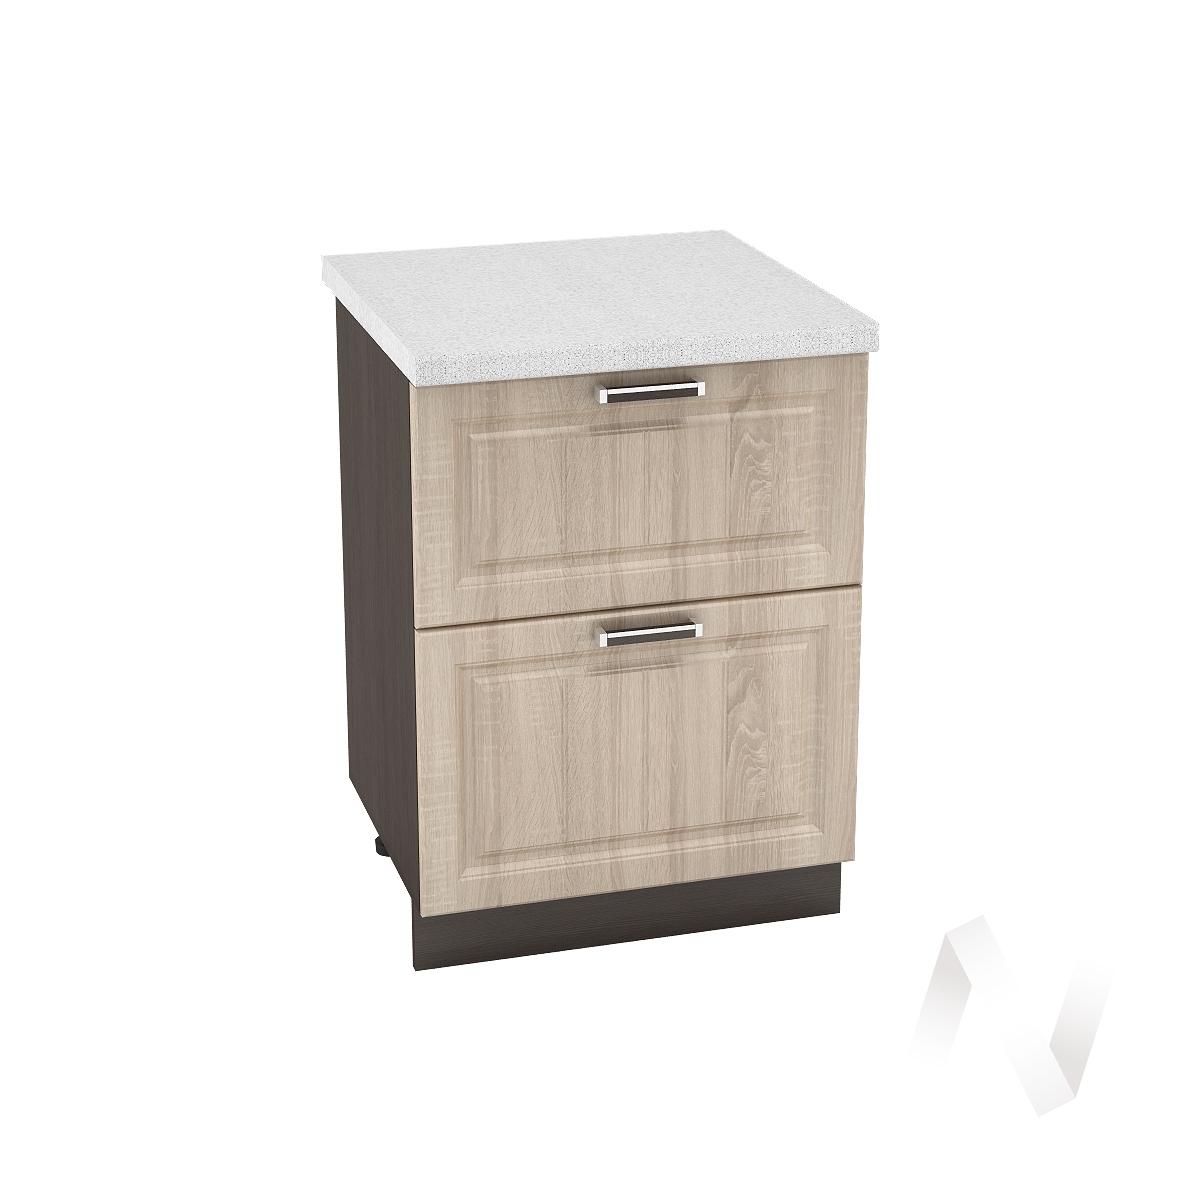 "Кухня ""Прага"": Шкаф нижний с 2-мя ящиками 600, ШН2Я 600 (дуб сонома/корпус венге)"